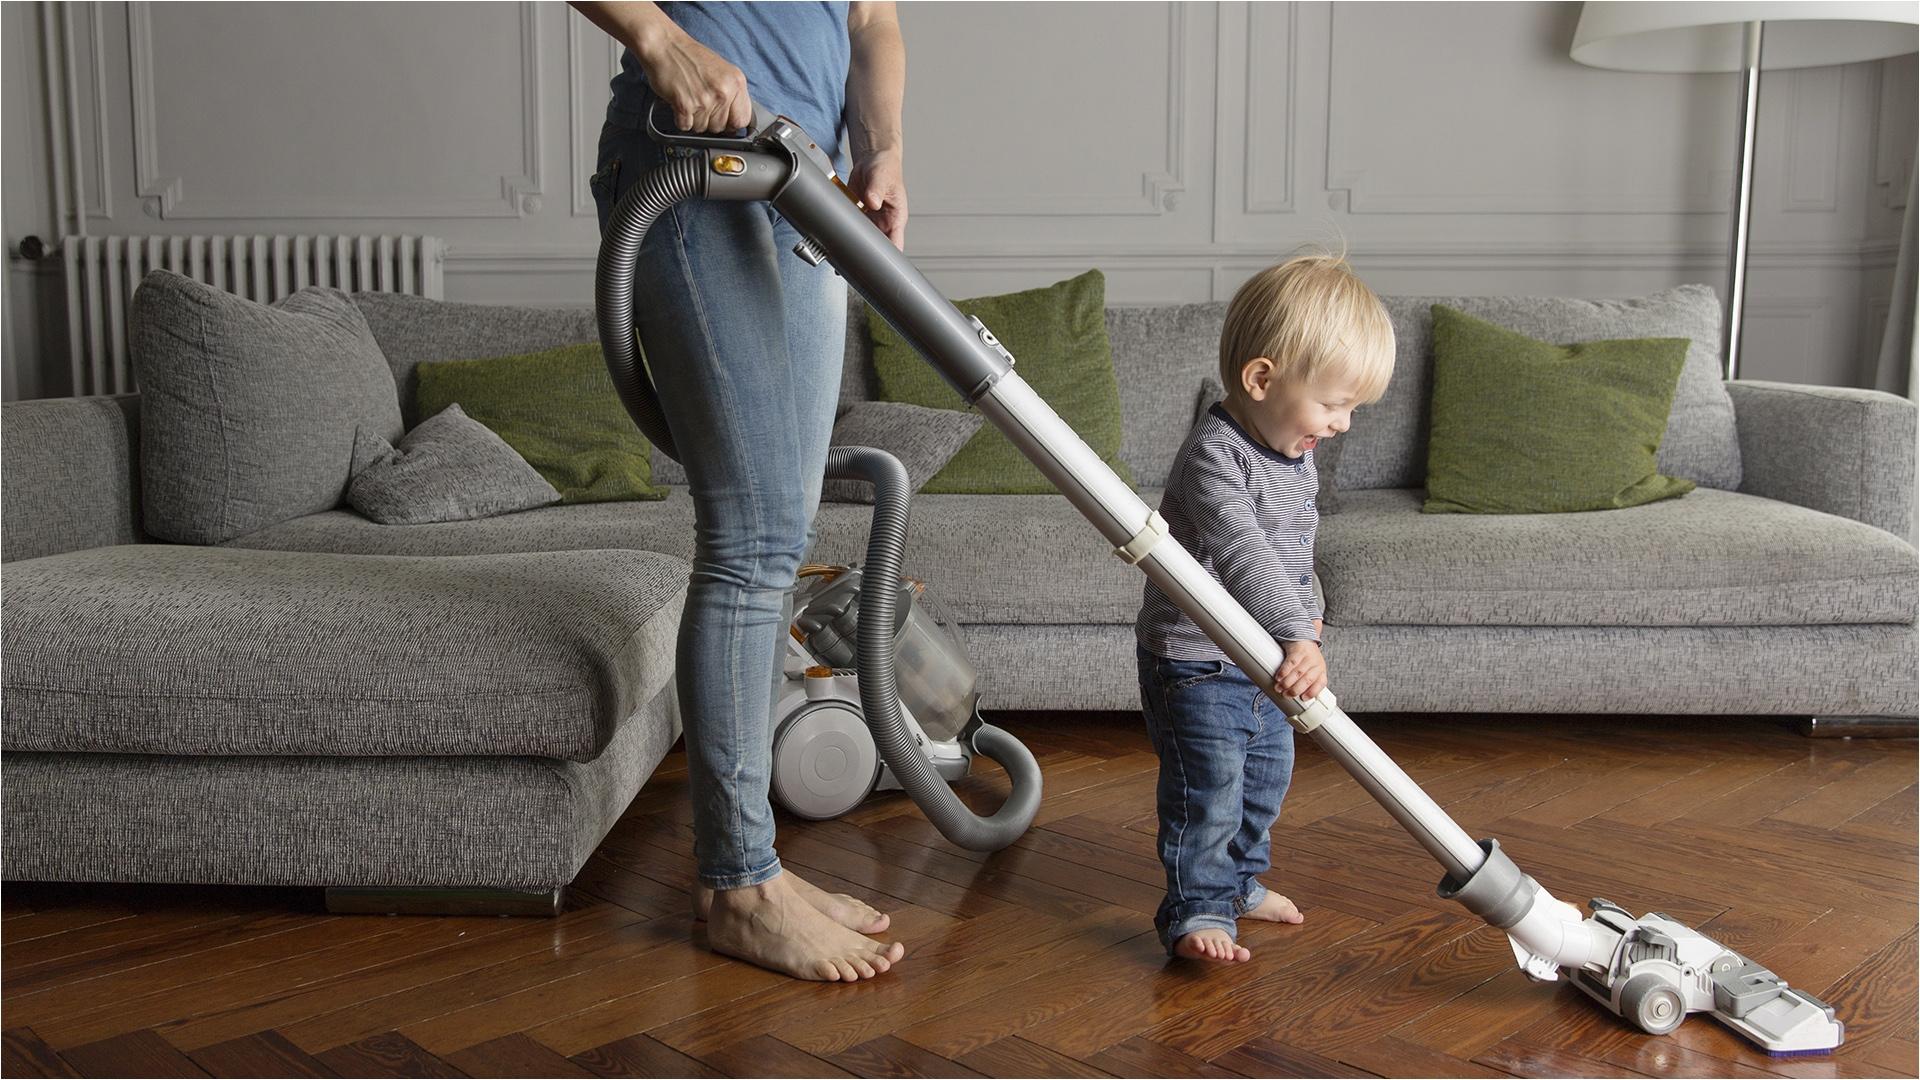 vacuums today 180405 tease 02 ff32665556a65fc682f1087e50253cdd jpg